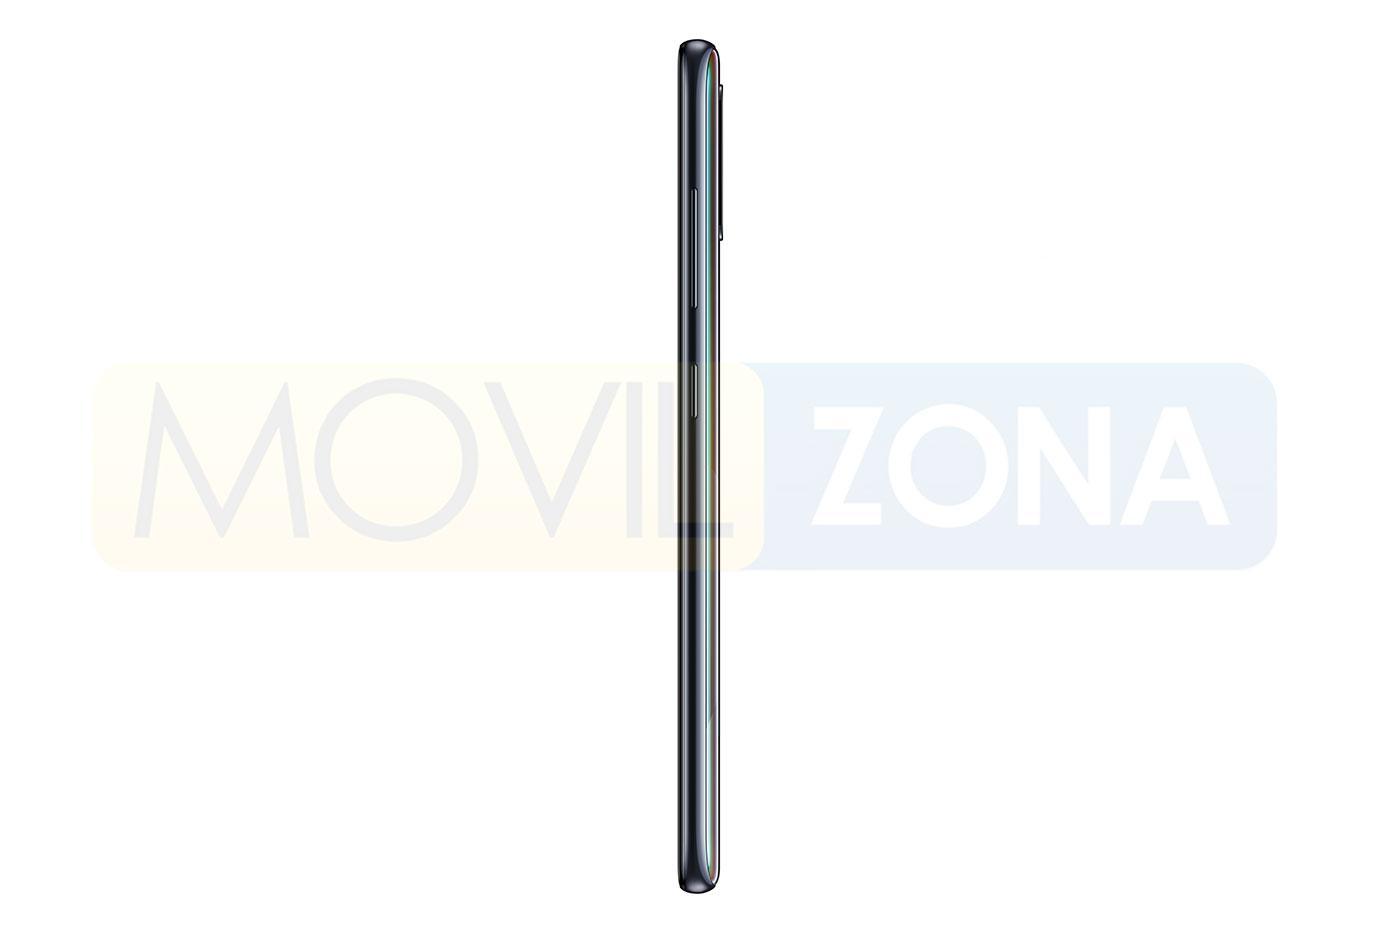 Samsung Galaxy A51 lateral